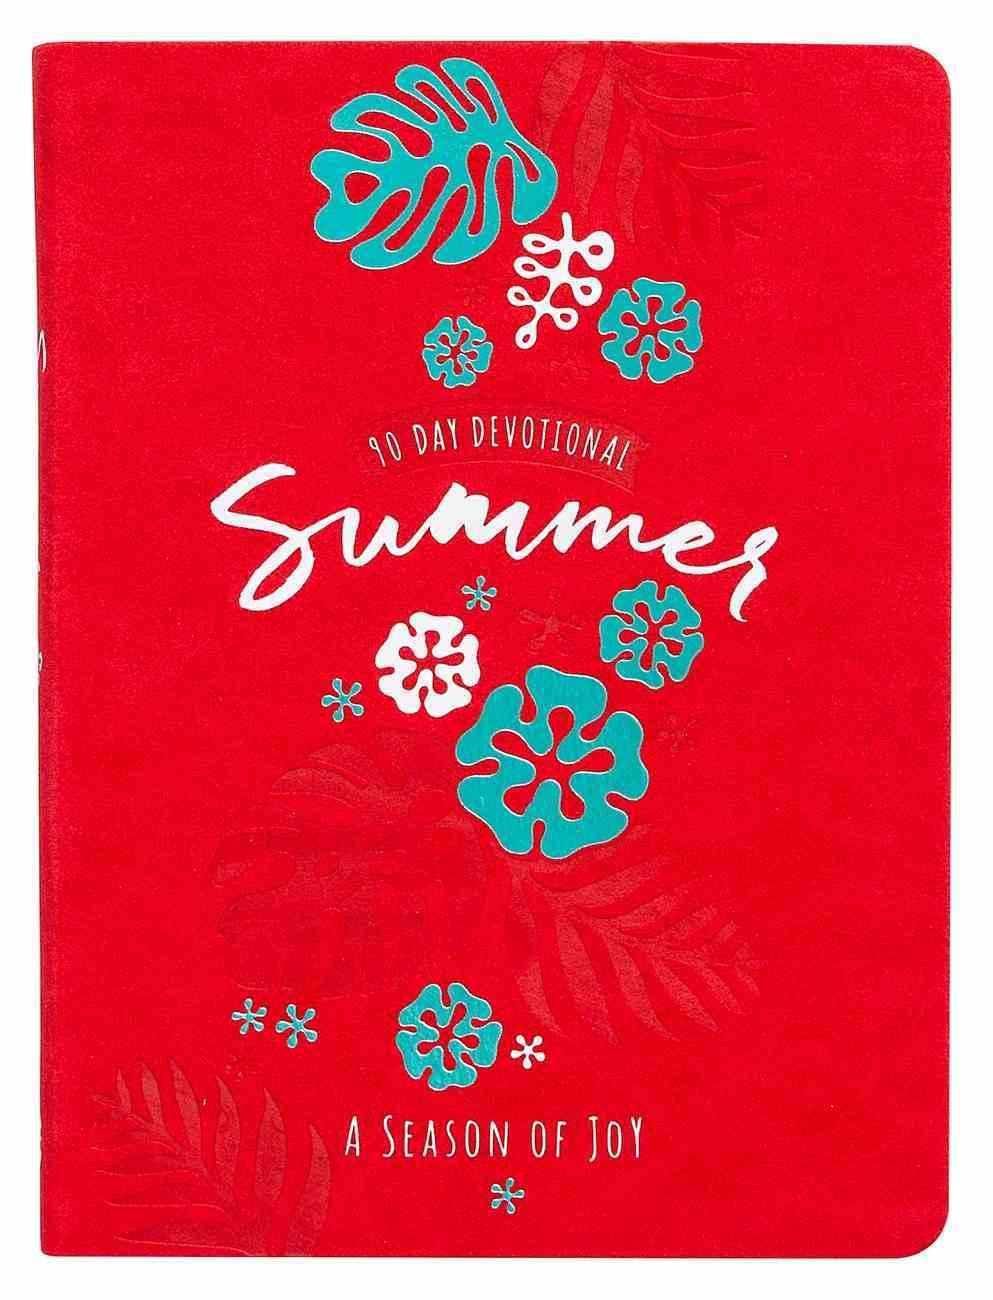 90-Day Devotional: Summer - a Season of Joy Imitation Leather